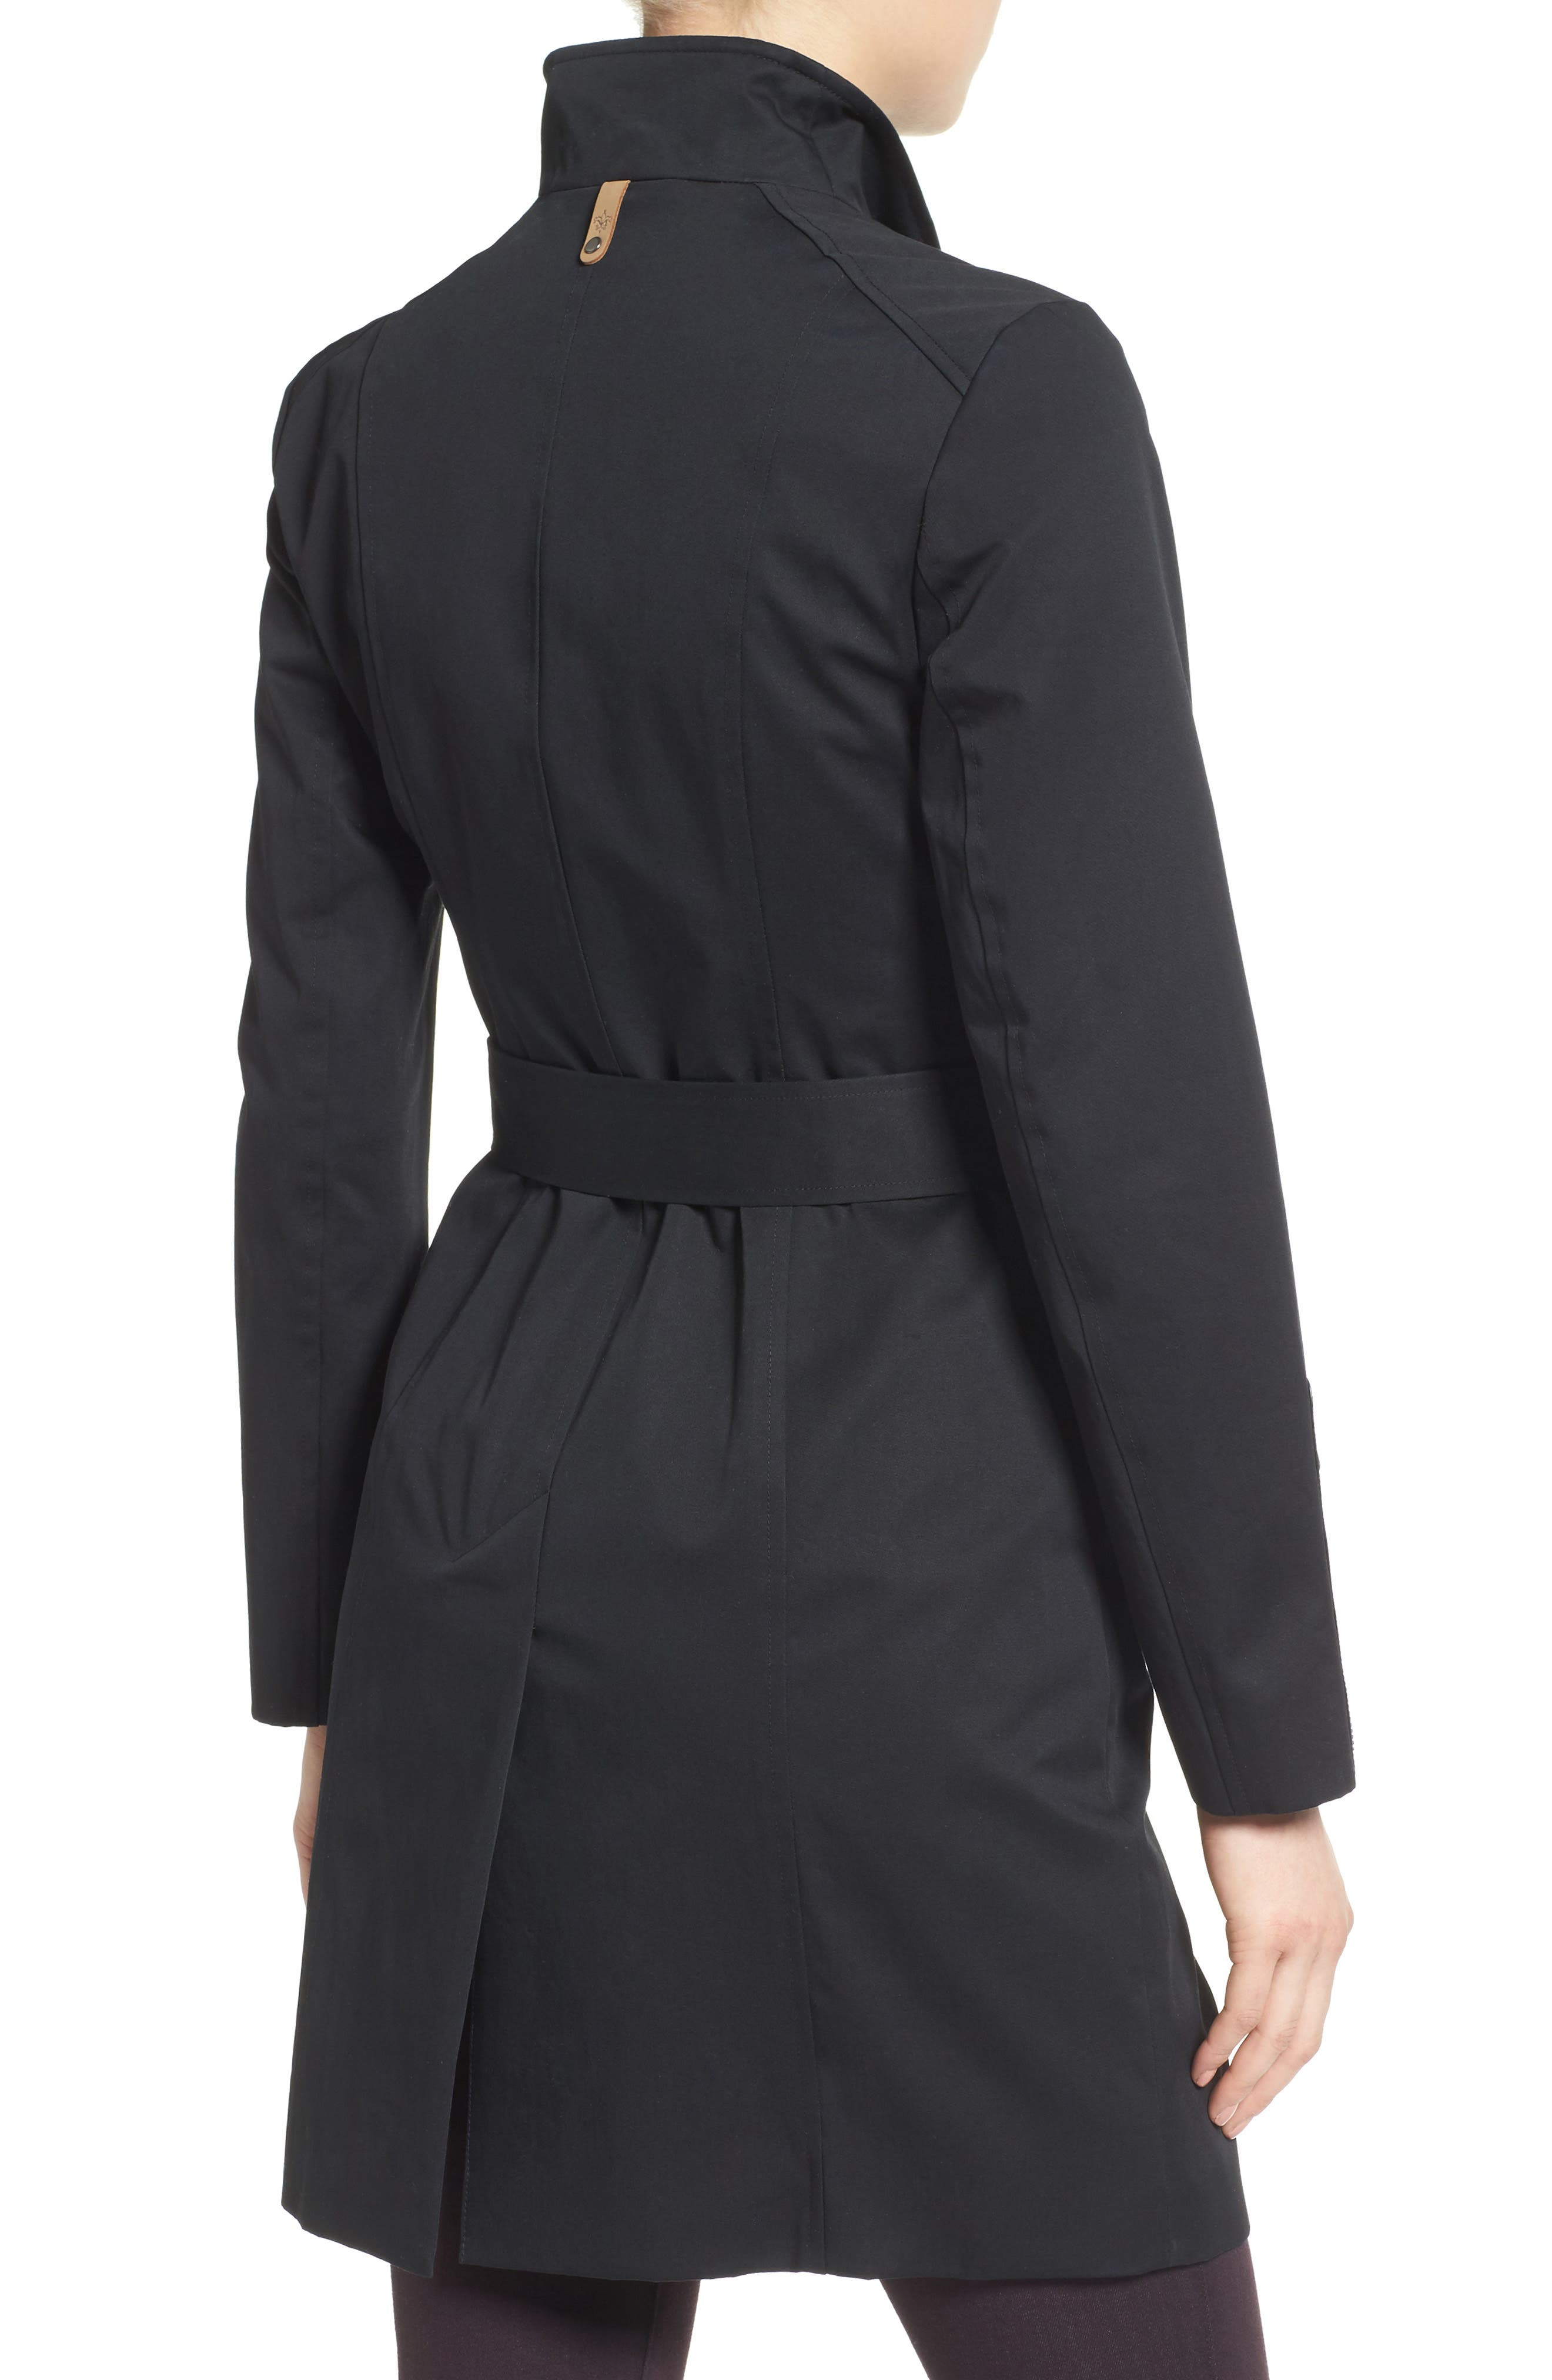 MACKAGE, Estela Belted Long Trench Coat, Alternate thumbnail 2, color, 001